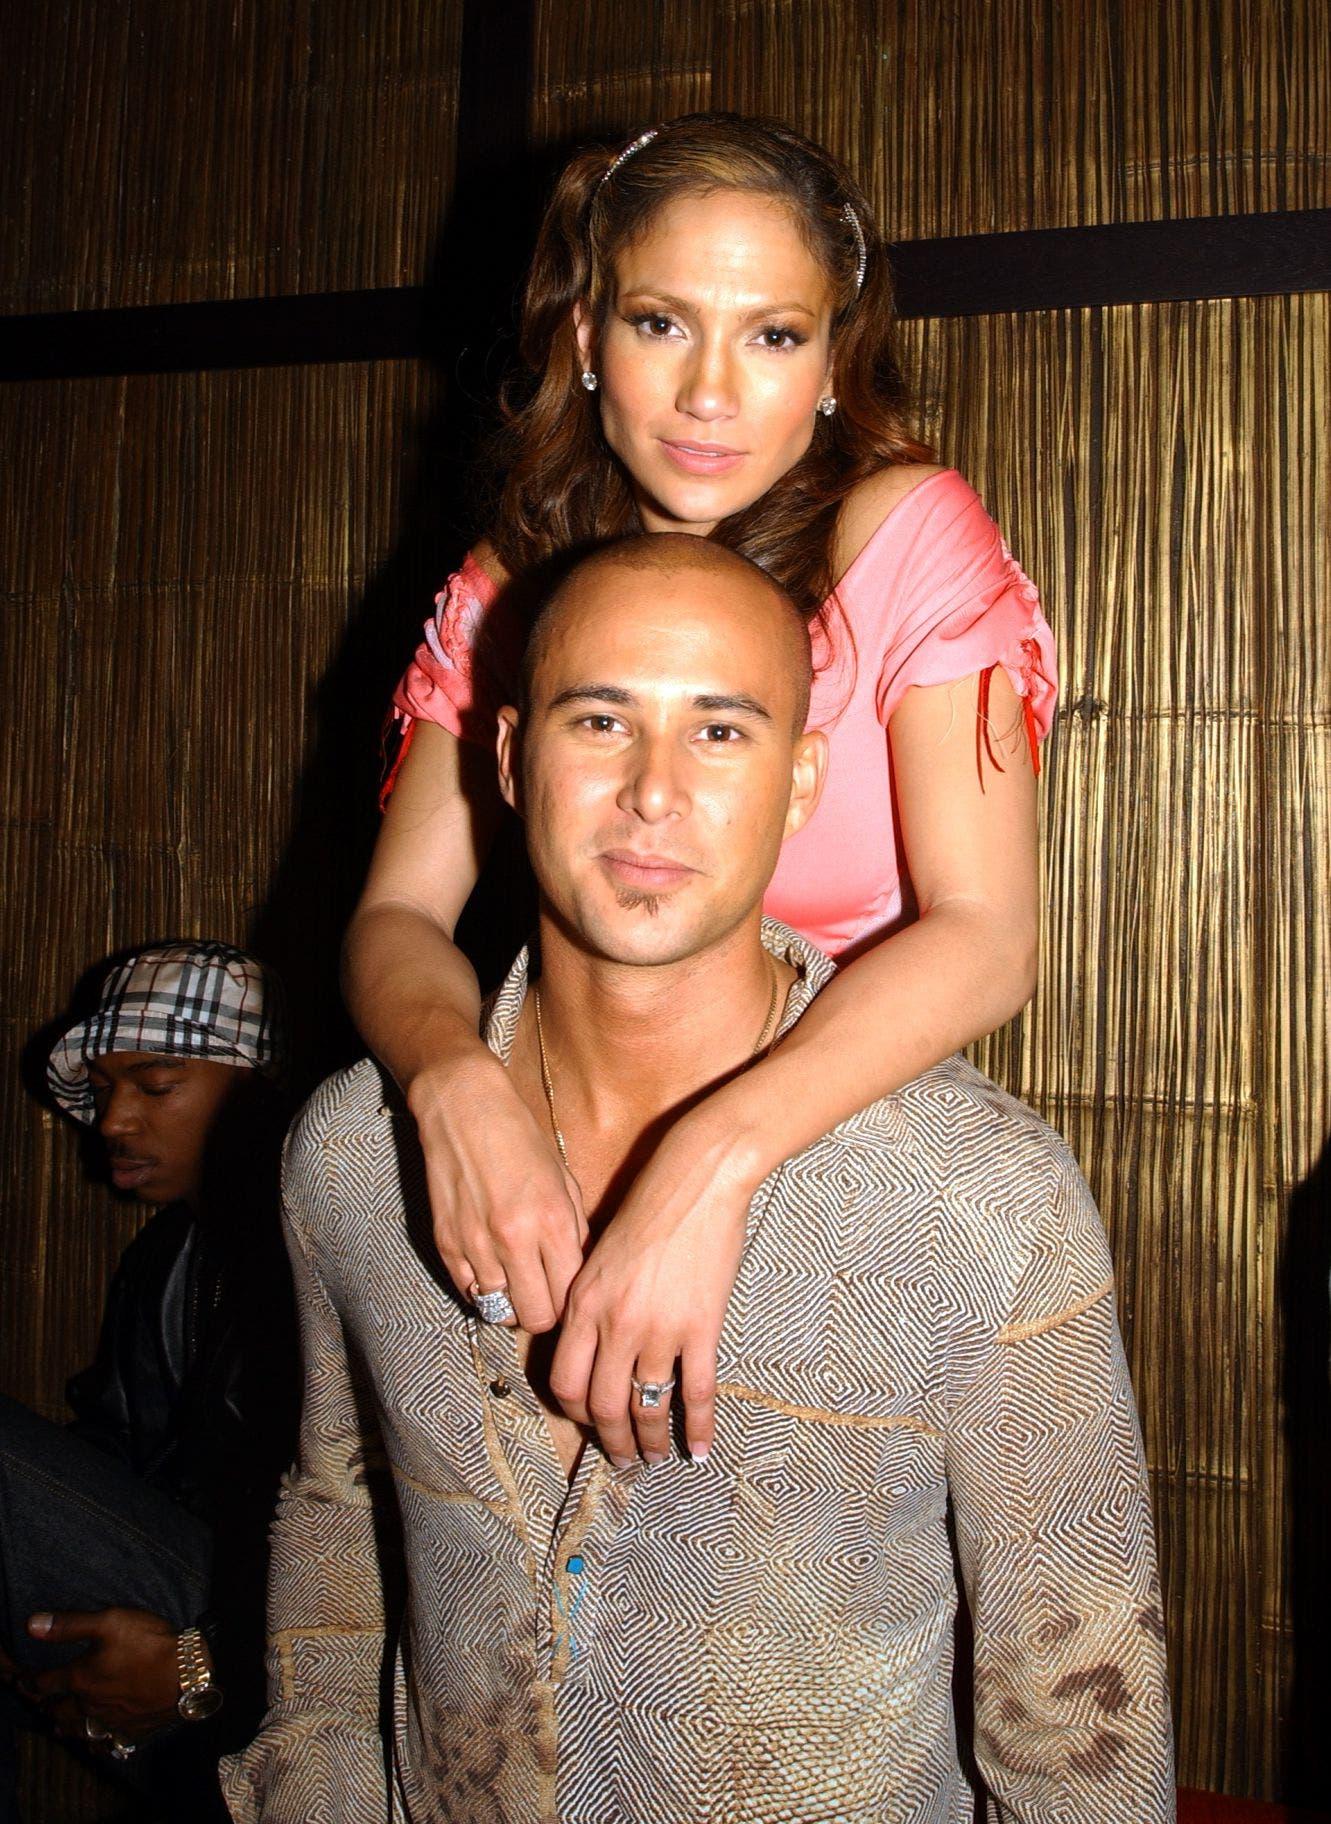 جينيفر مع خطيبها كريس جود